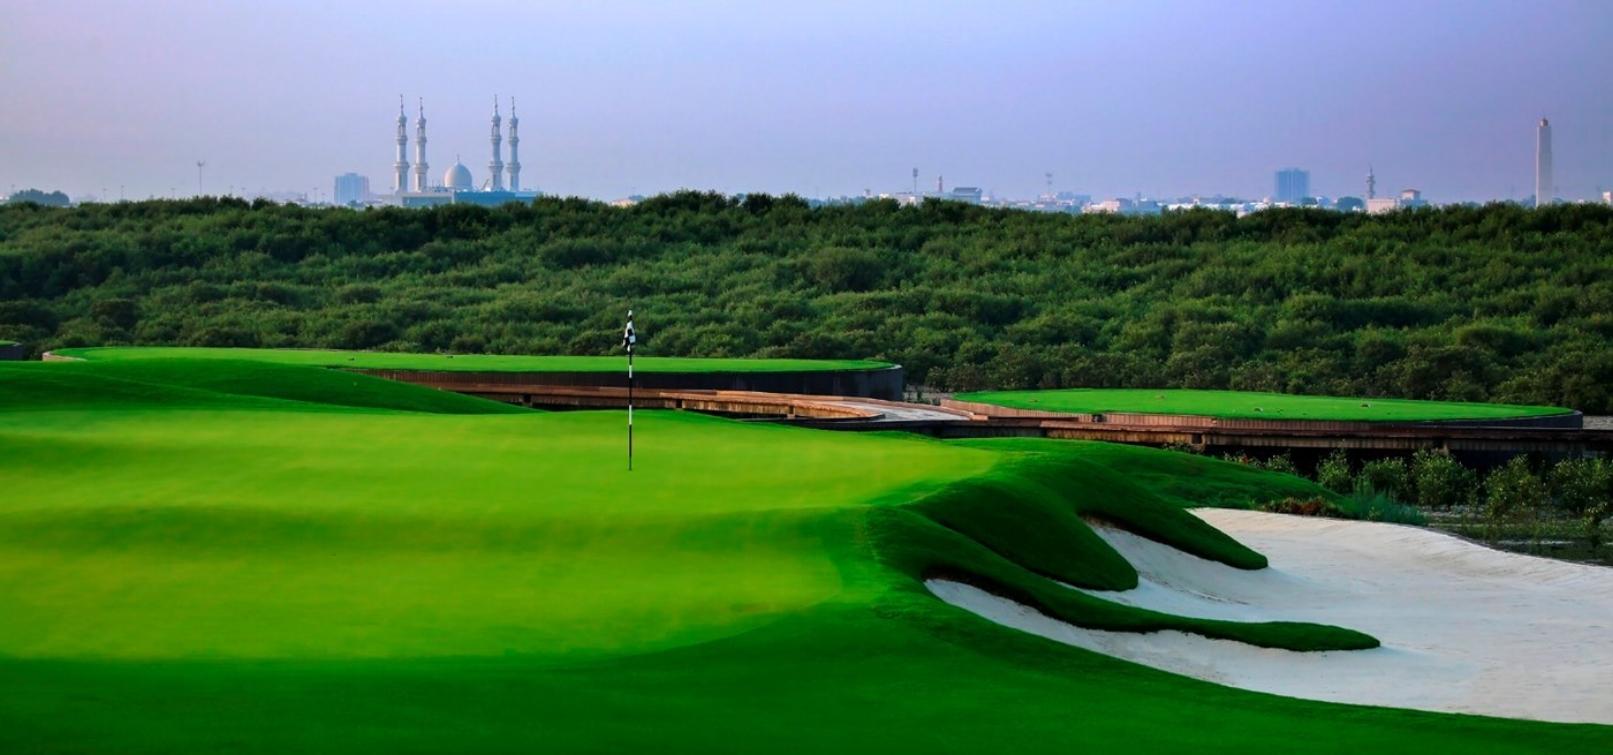 al-zorah-golf-club-course-image-3.jpg